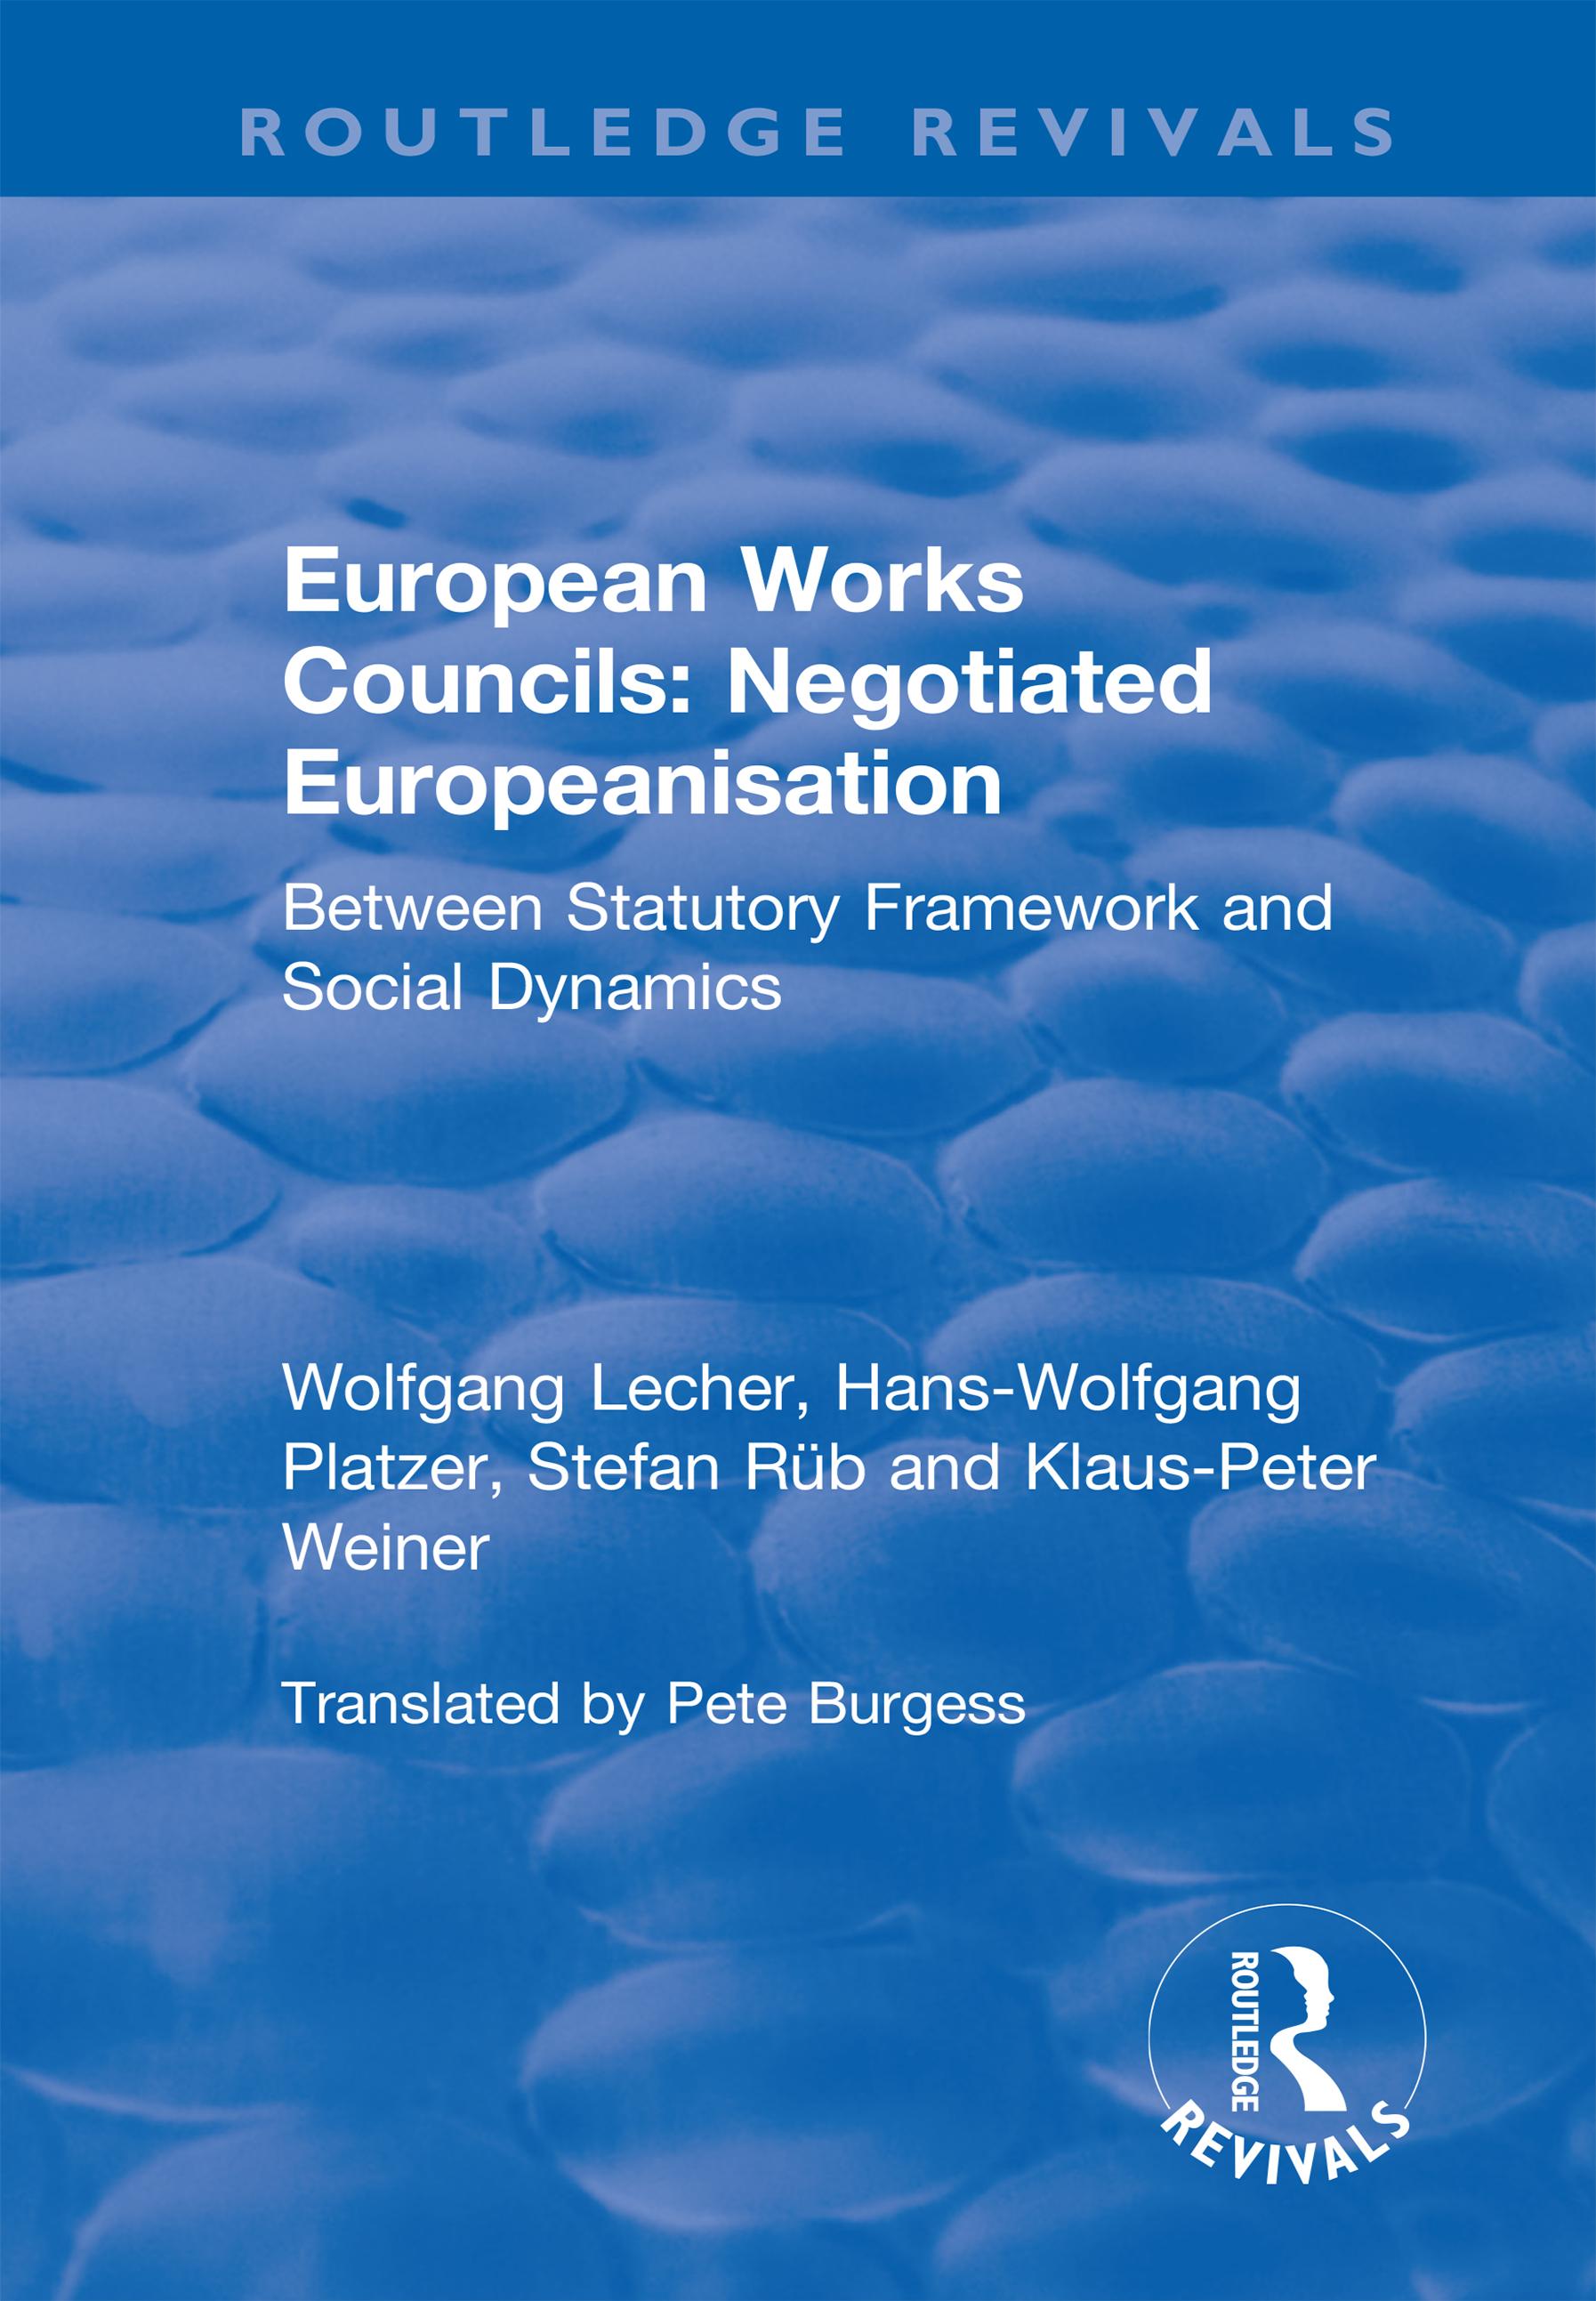 Negotiation, representation, Europeanisation: the quality of the EWC process